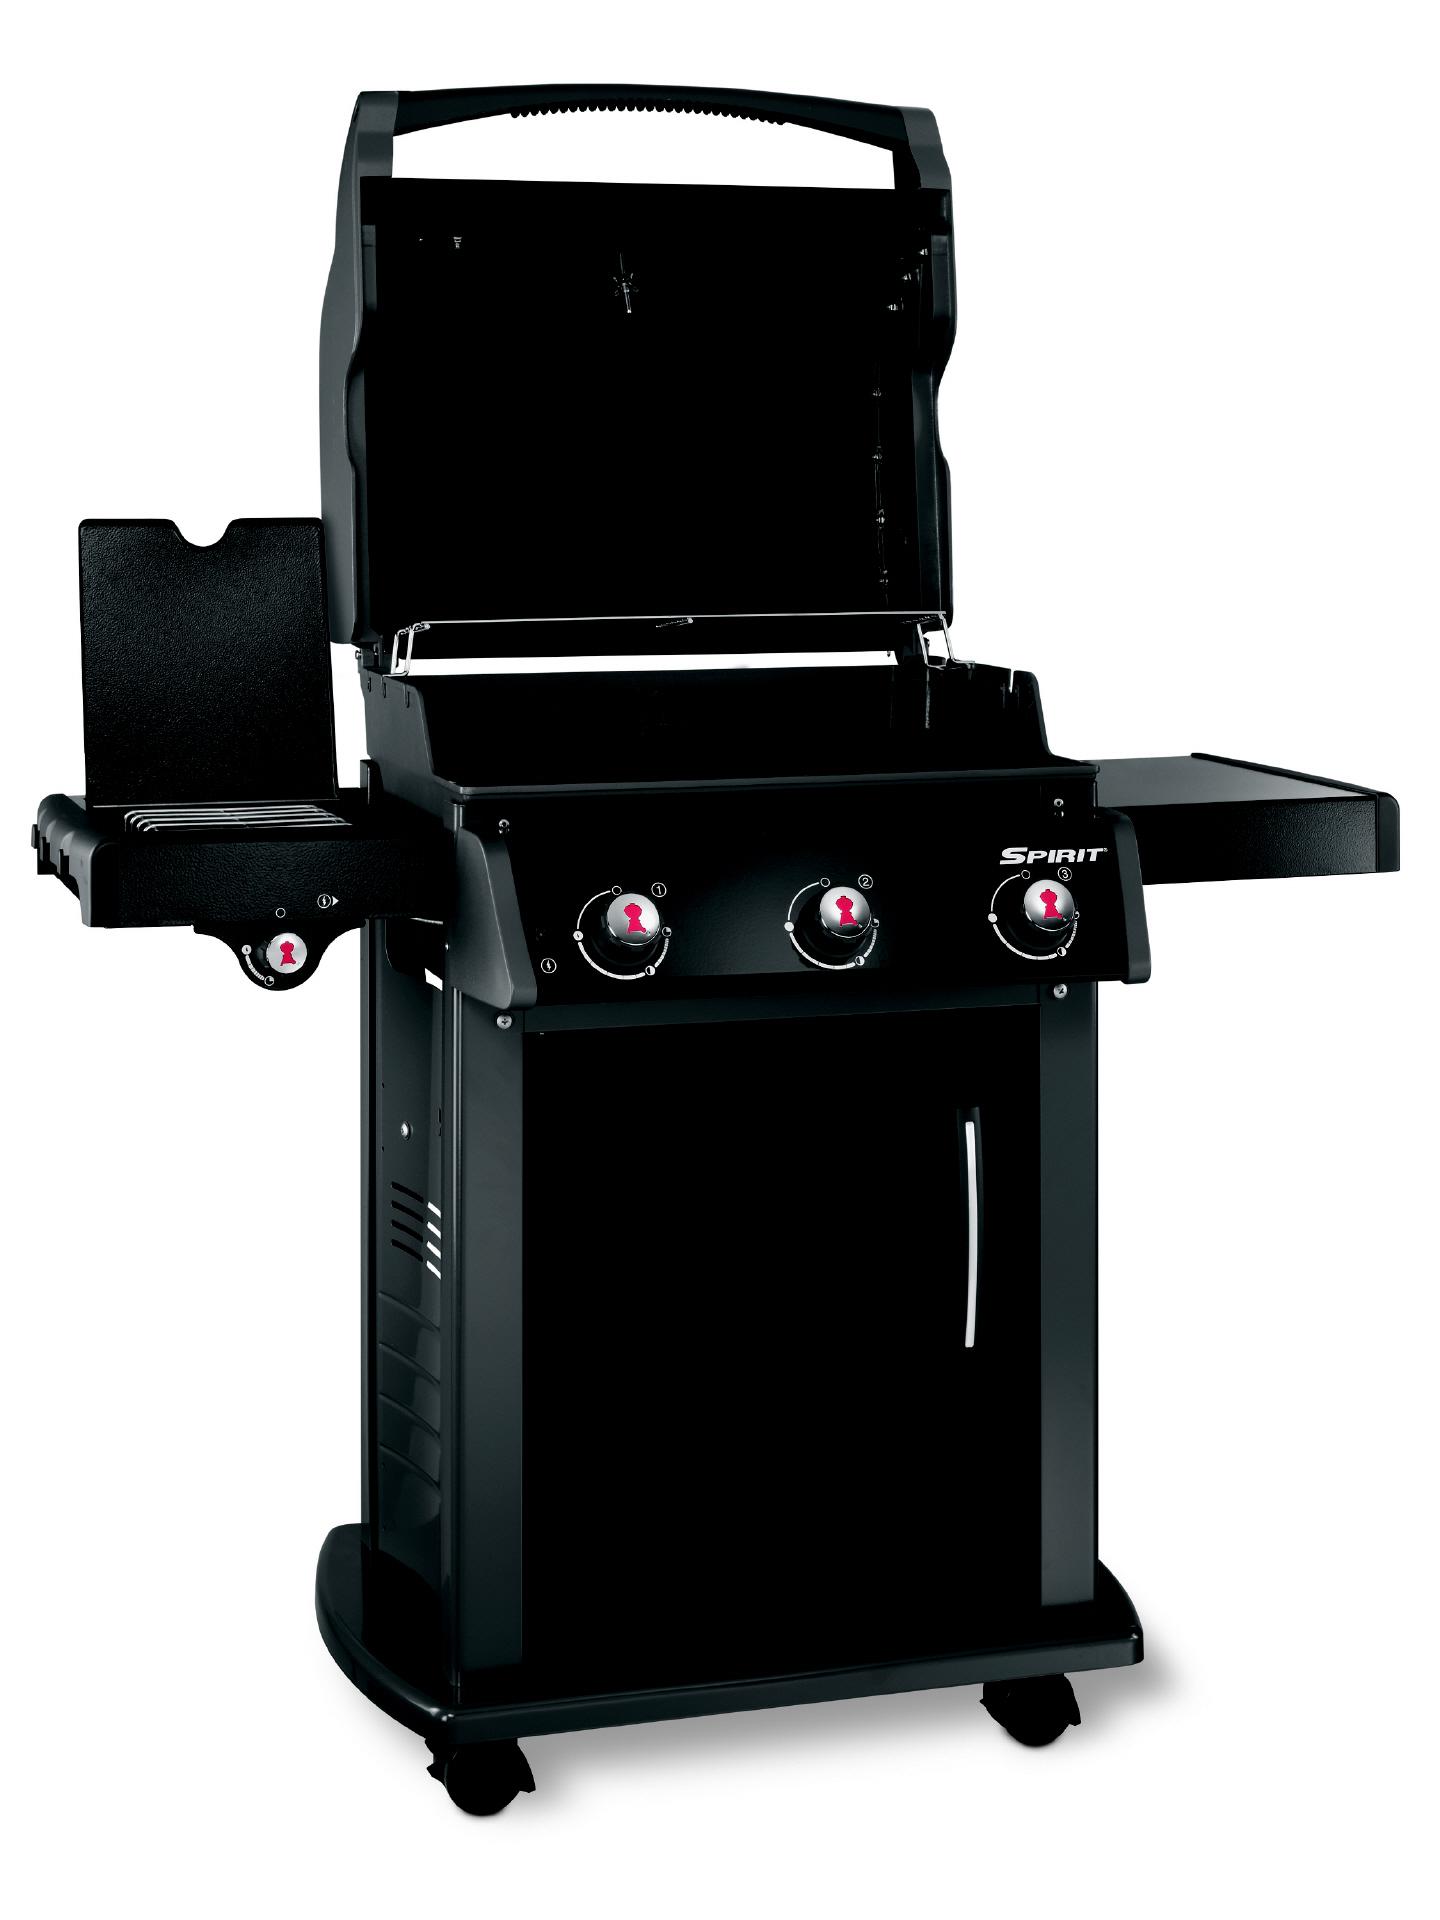 weber spirit e 320 original gbs black. Black Bedroom Furniture Sets. Home Design Ideas